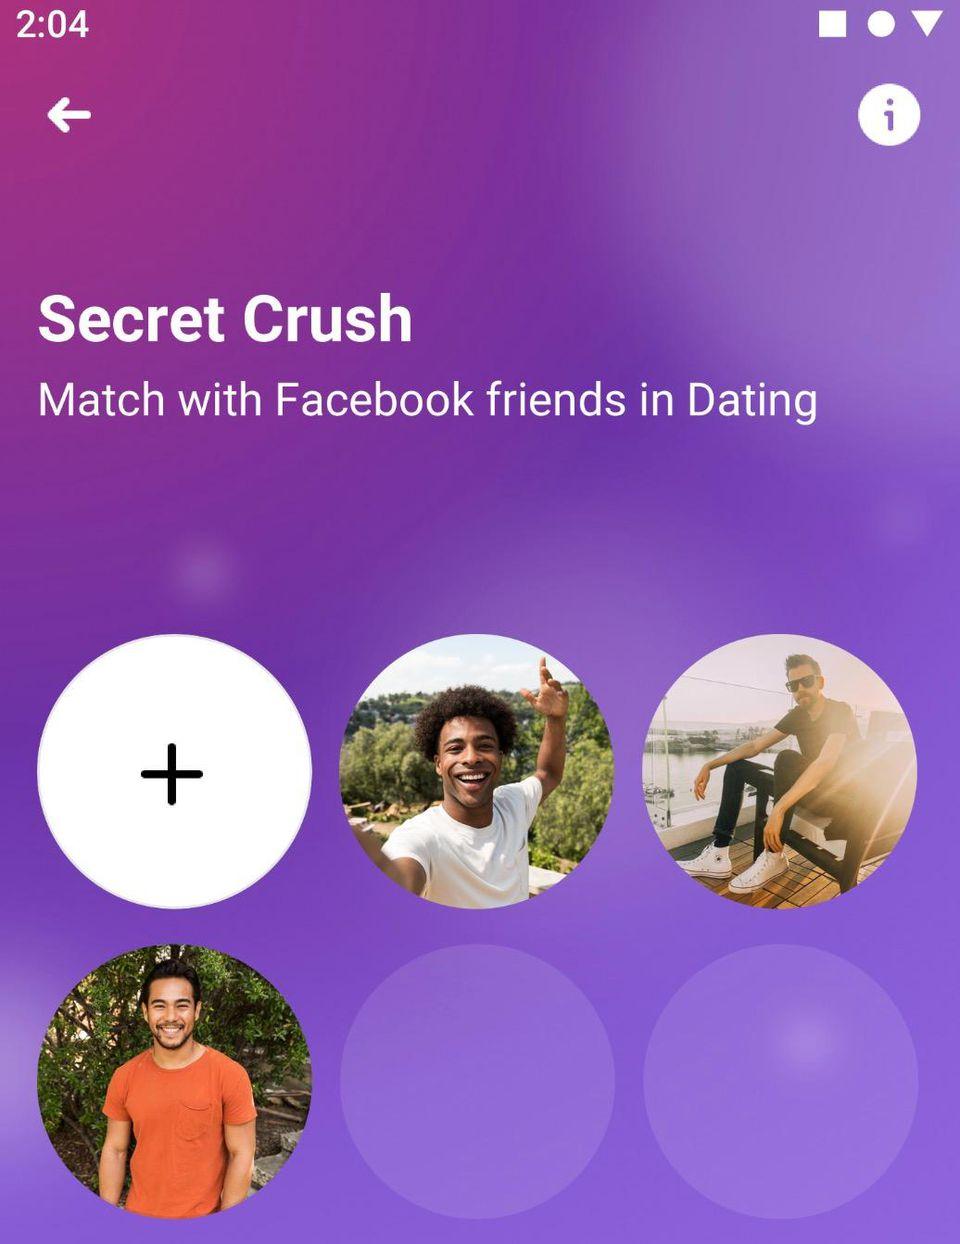 https___blogs-images.forbes.com_amitchowdhry_files_2019_05_Facebook-Secret-Crush-feature